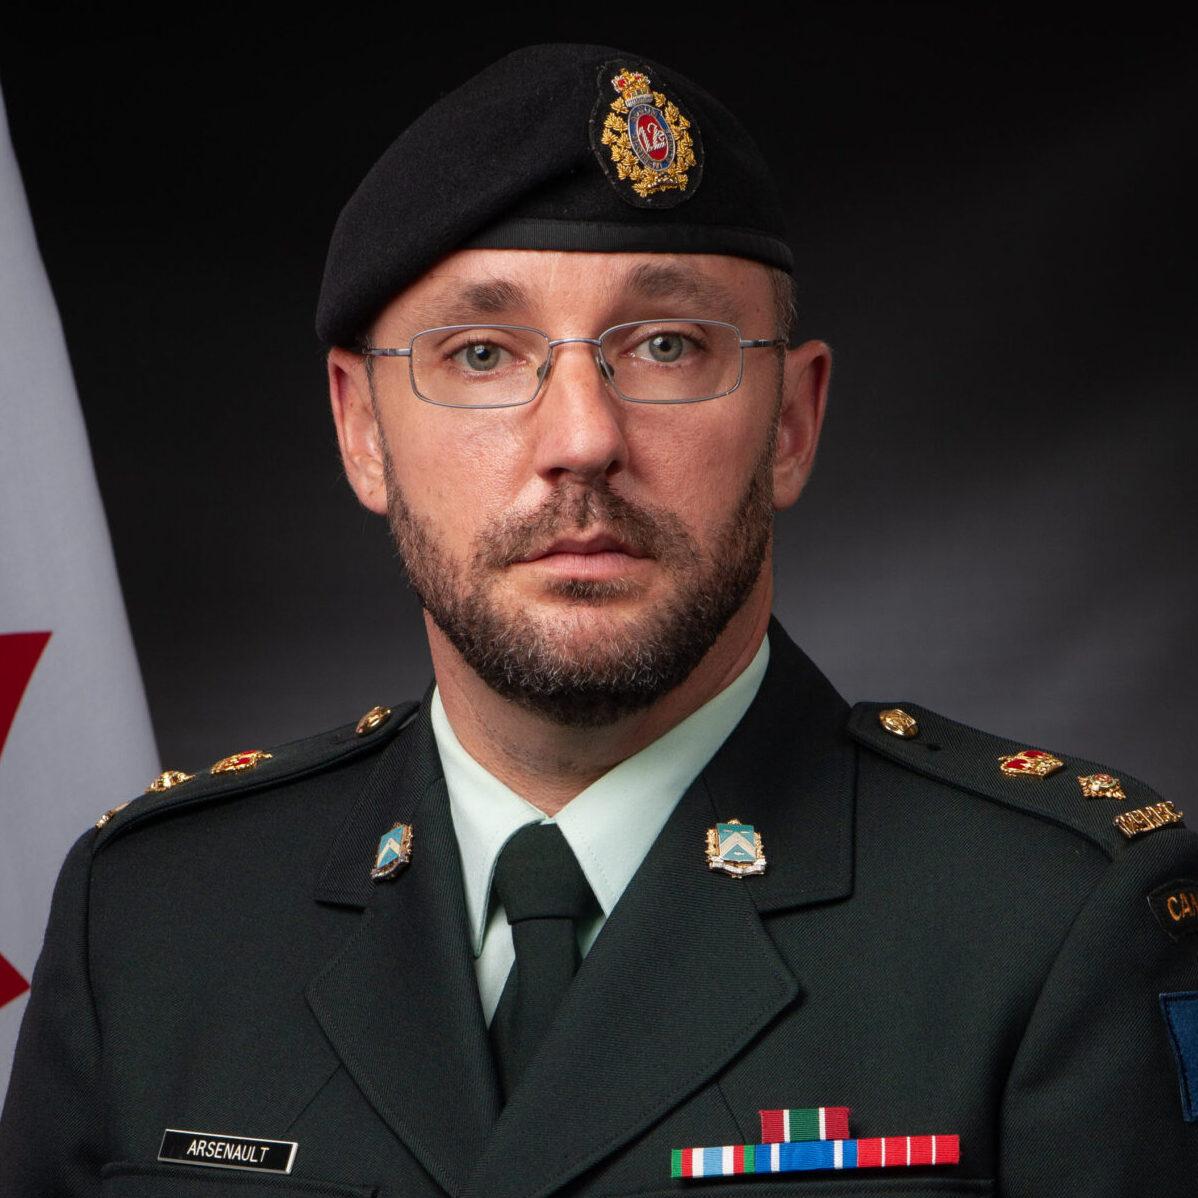 Lieutenant-colonel Arsenault